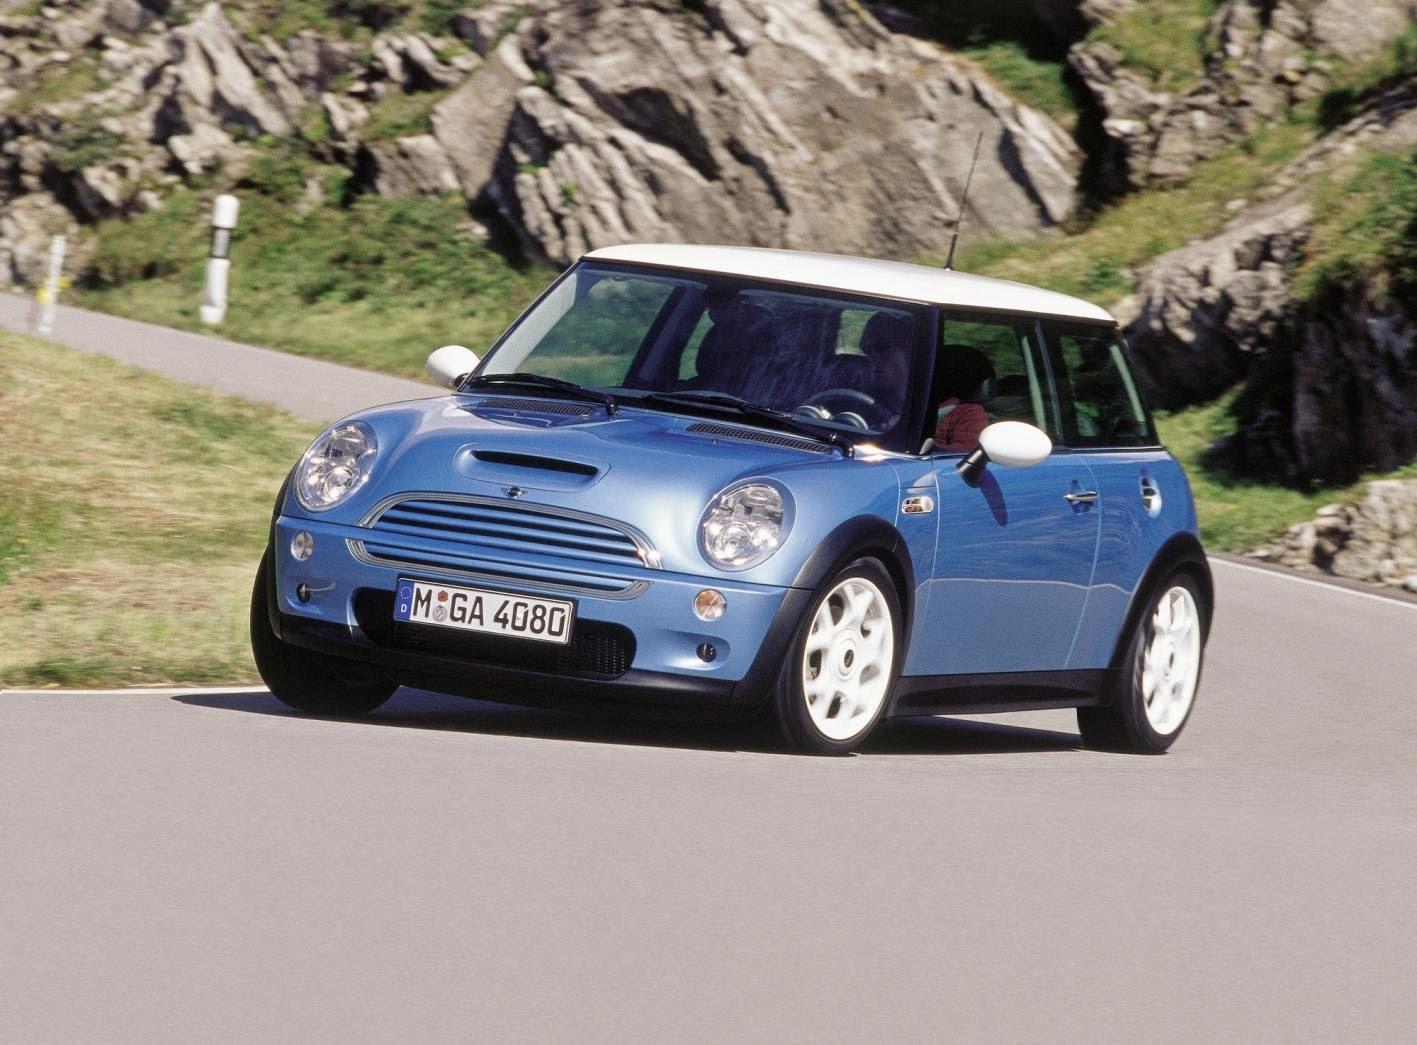 A Mini Cooper S in its natural habitat, a twisting mountain road